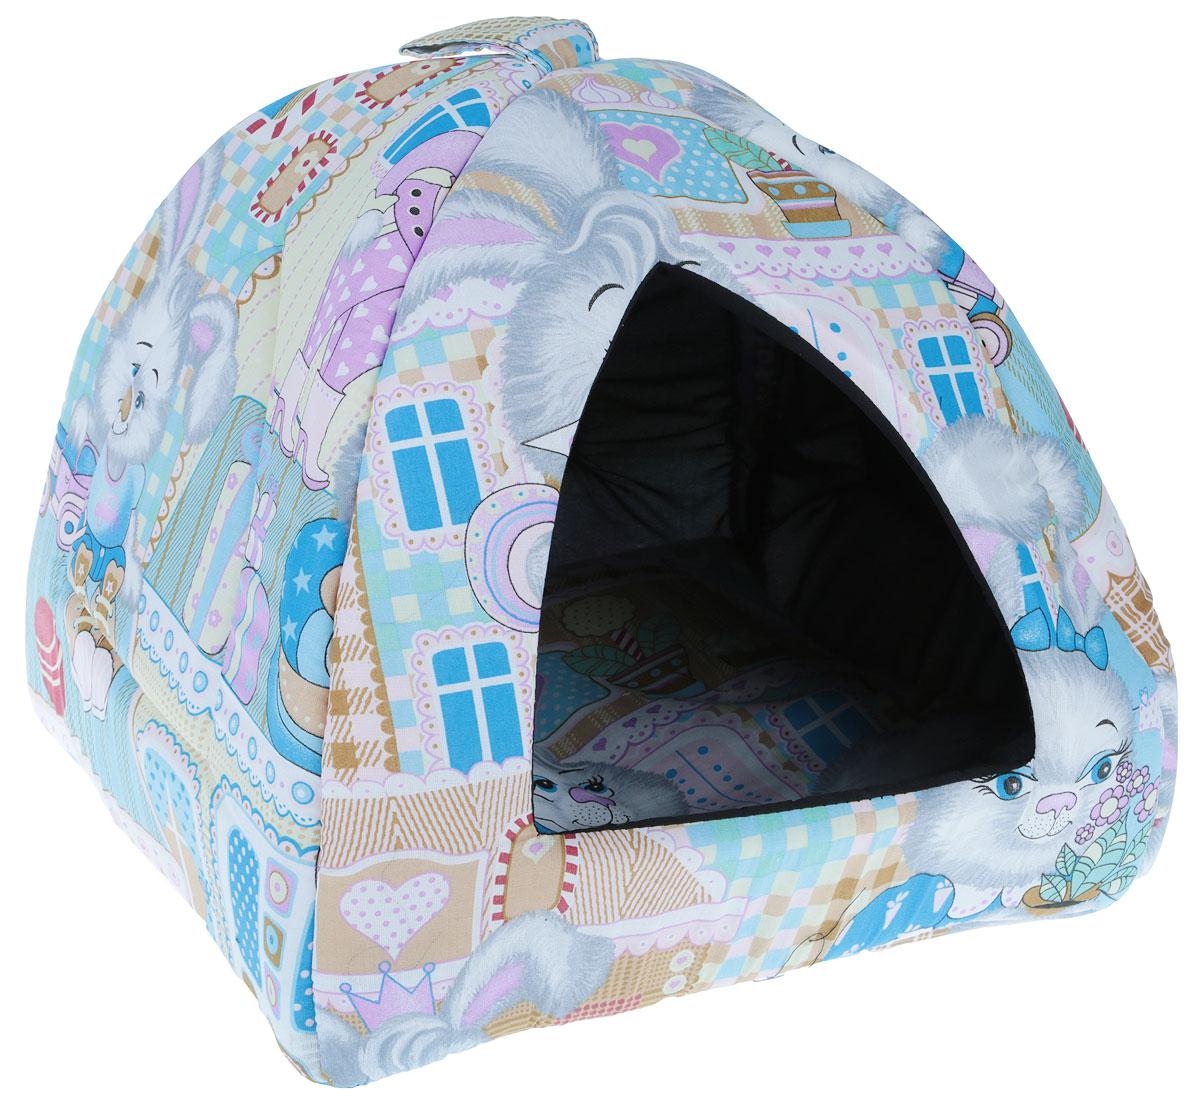 Домик для кошек и собак Гамма Юрта, 40 х 40 х 36 см гамма миска для кошек и собак n1